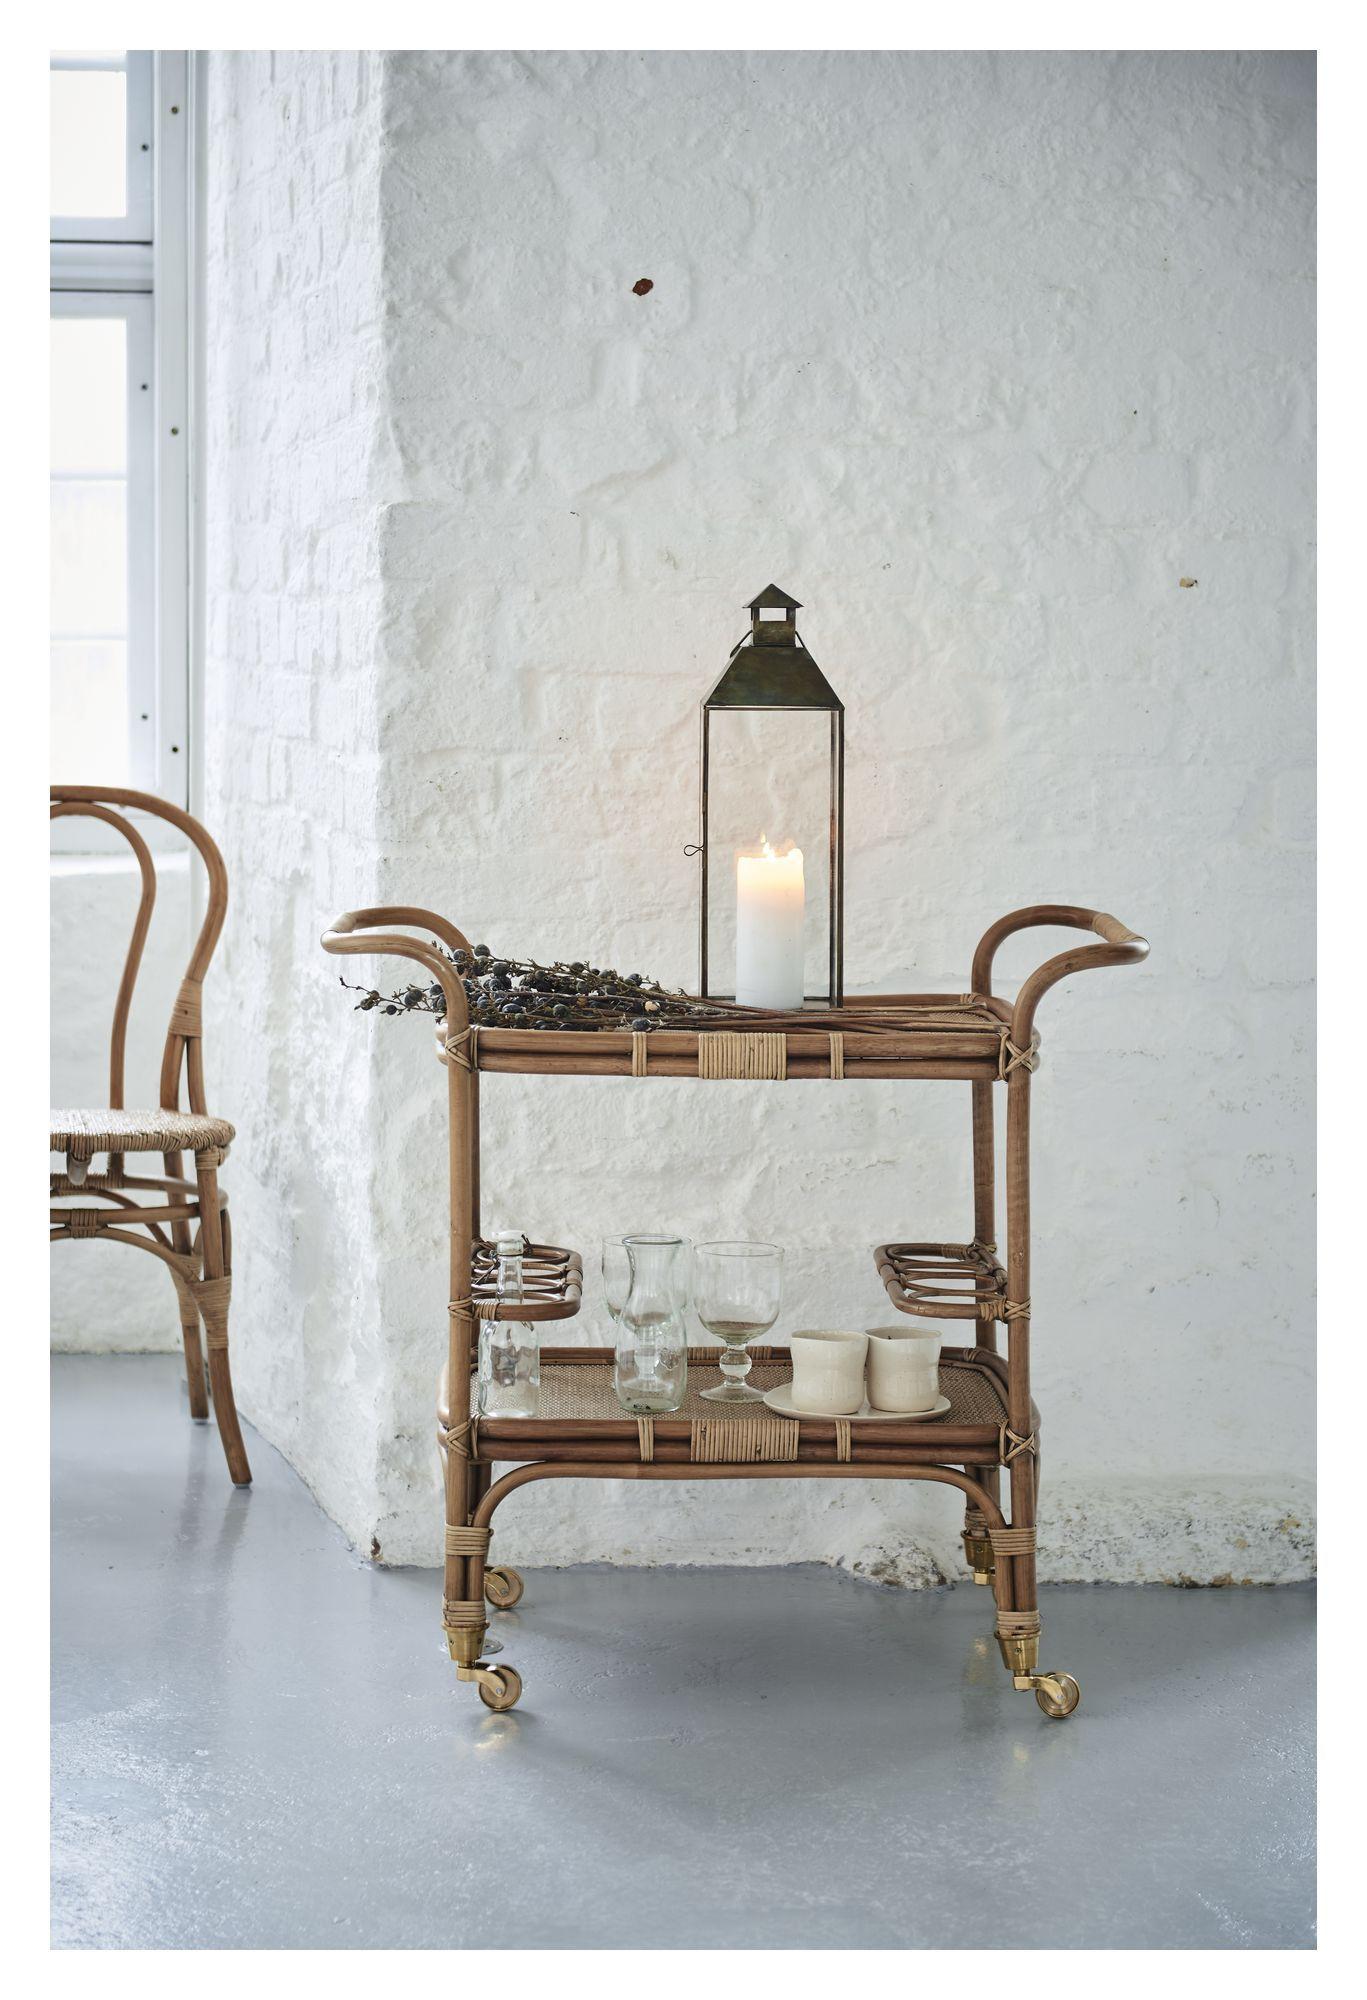 Sika-Design Carlo Barbord m/hjul - Antique - Originals by Sika